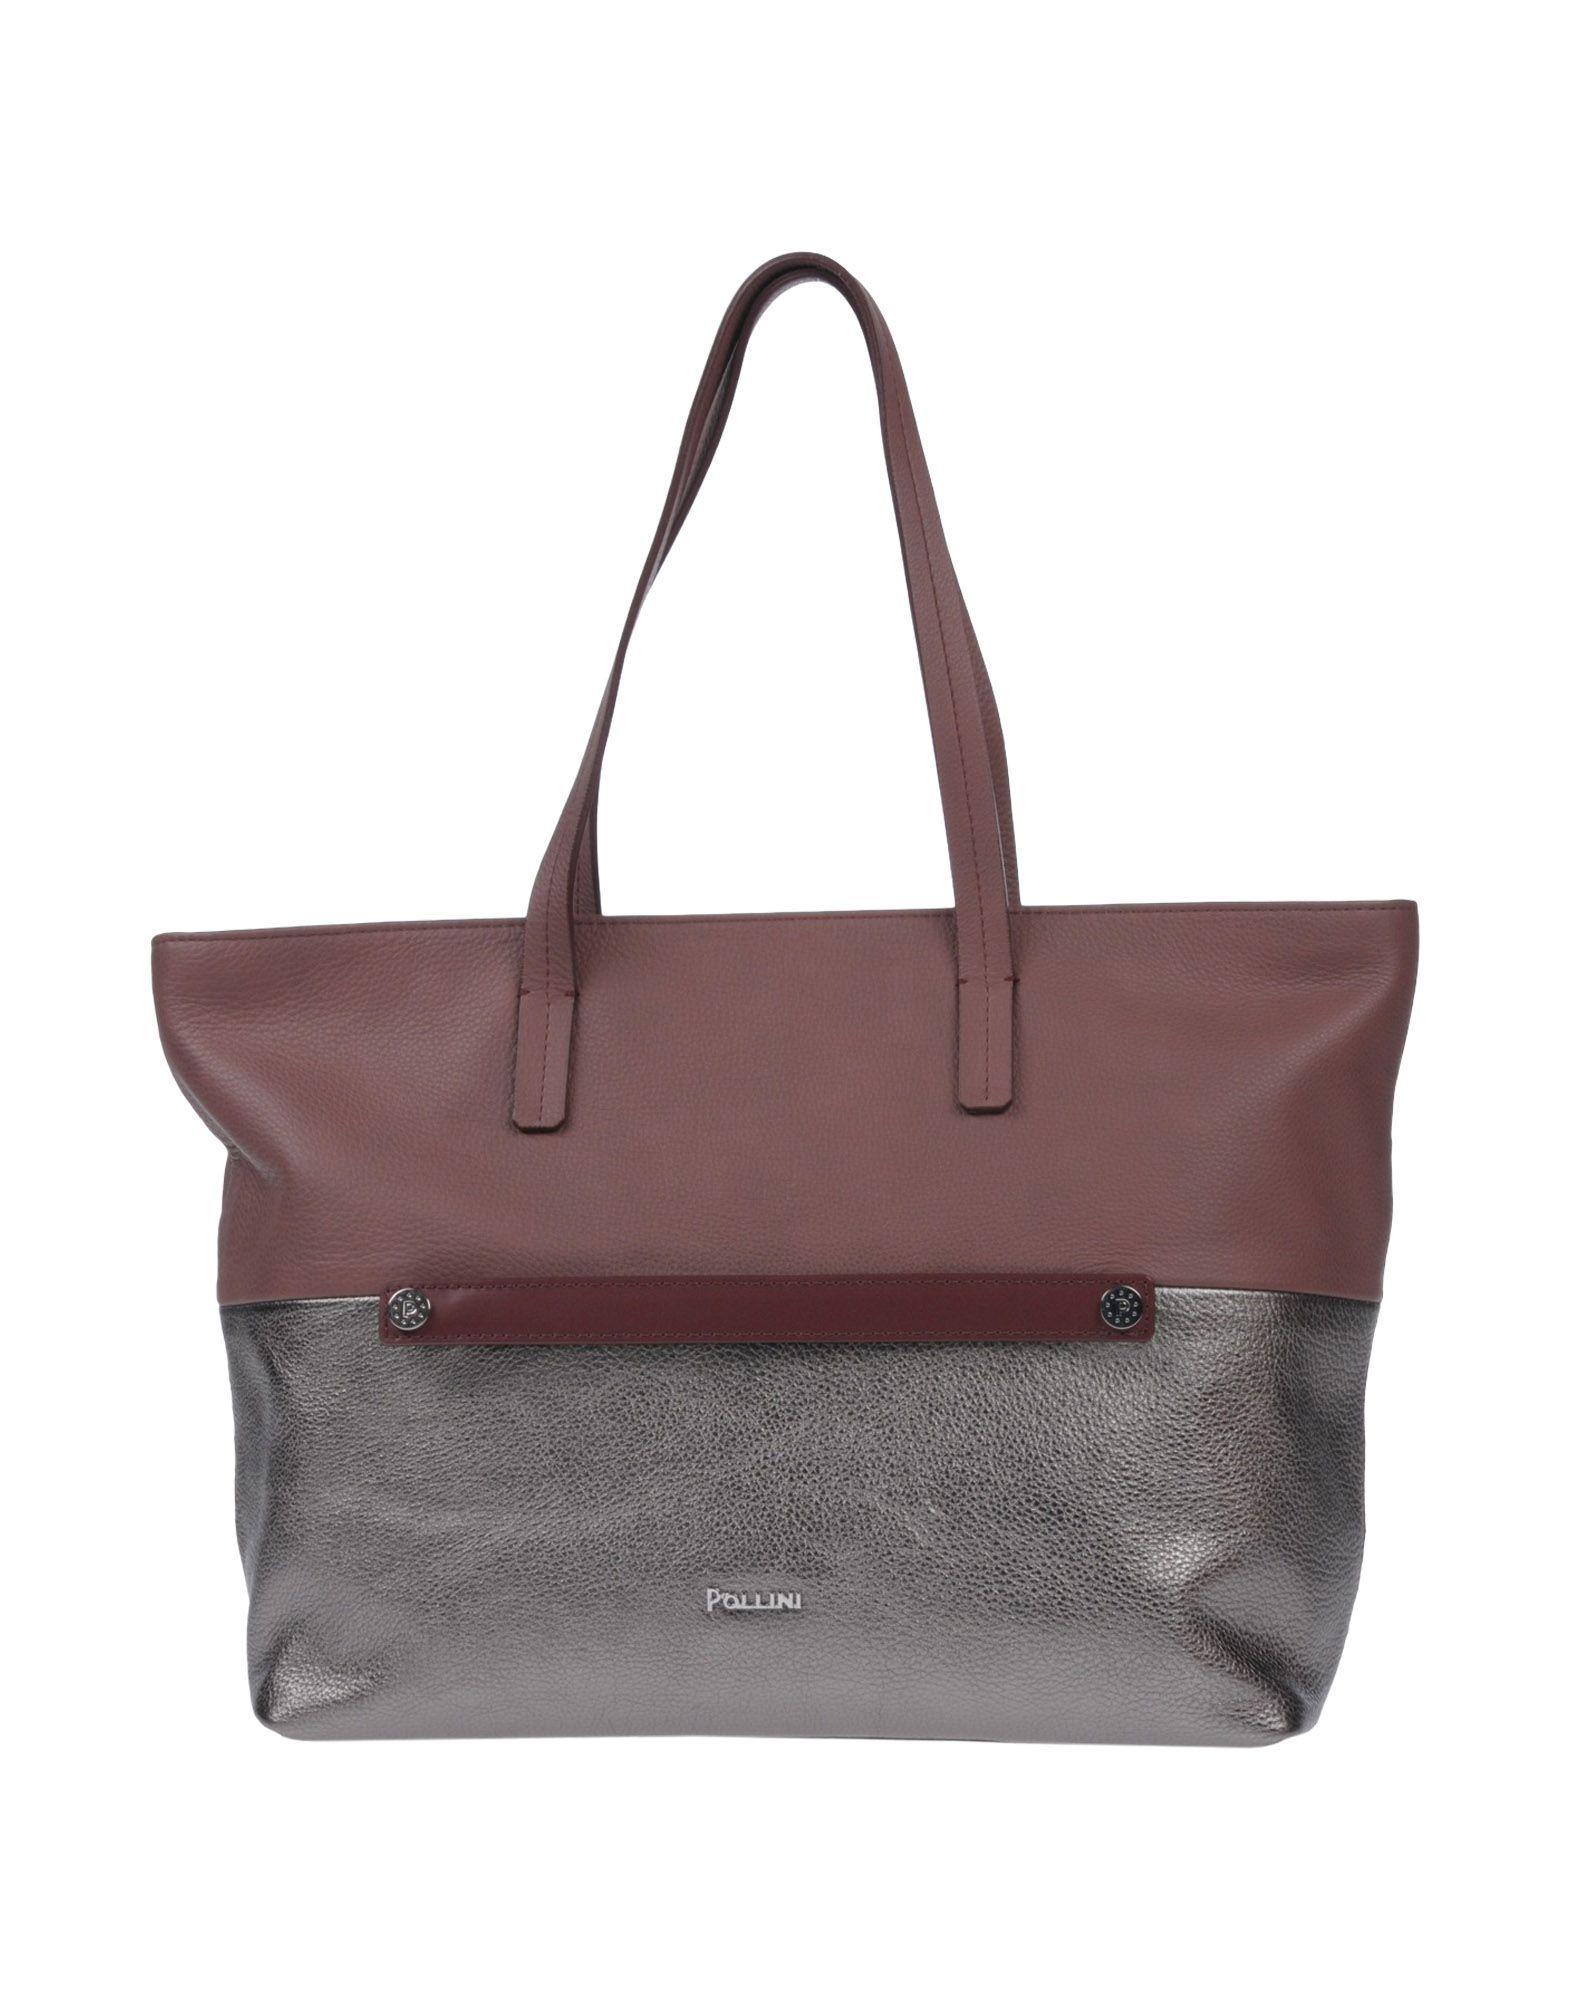 Pollini Handbag In Light Brown